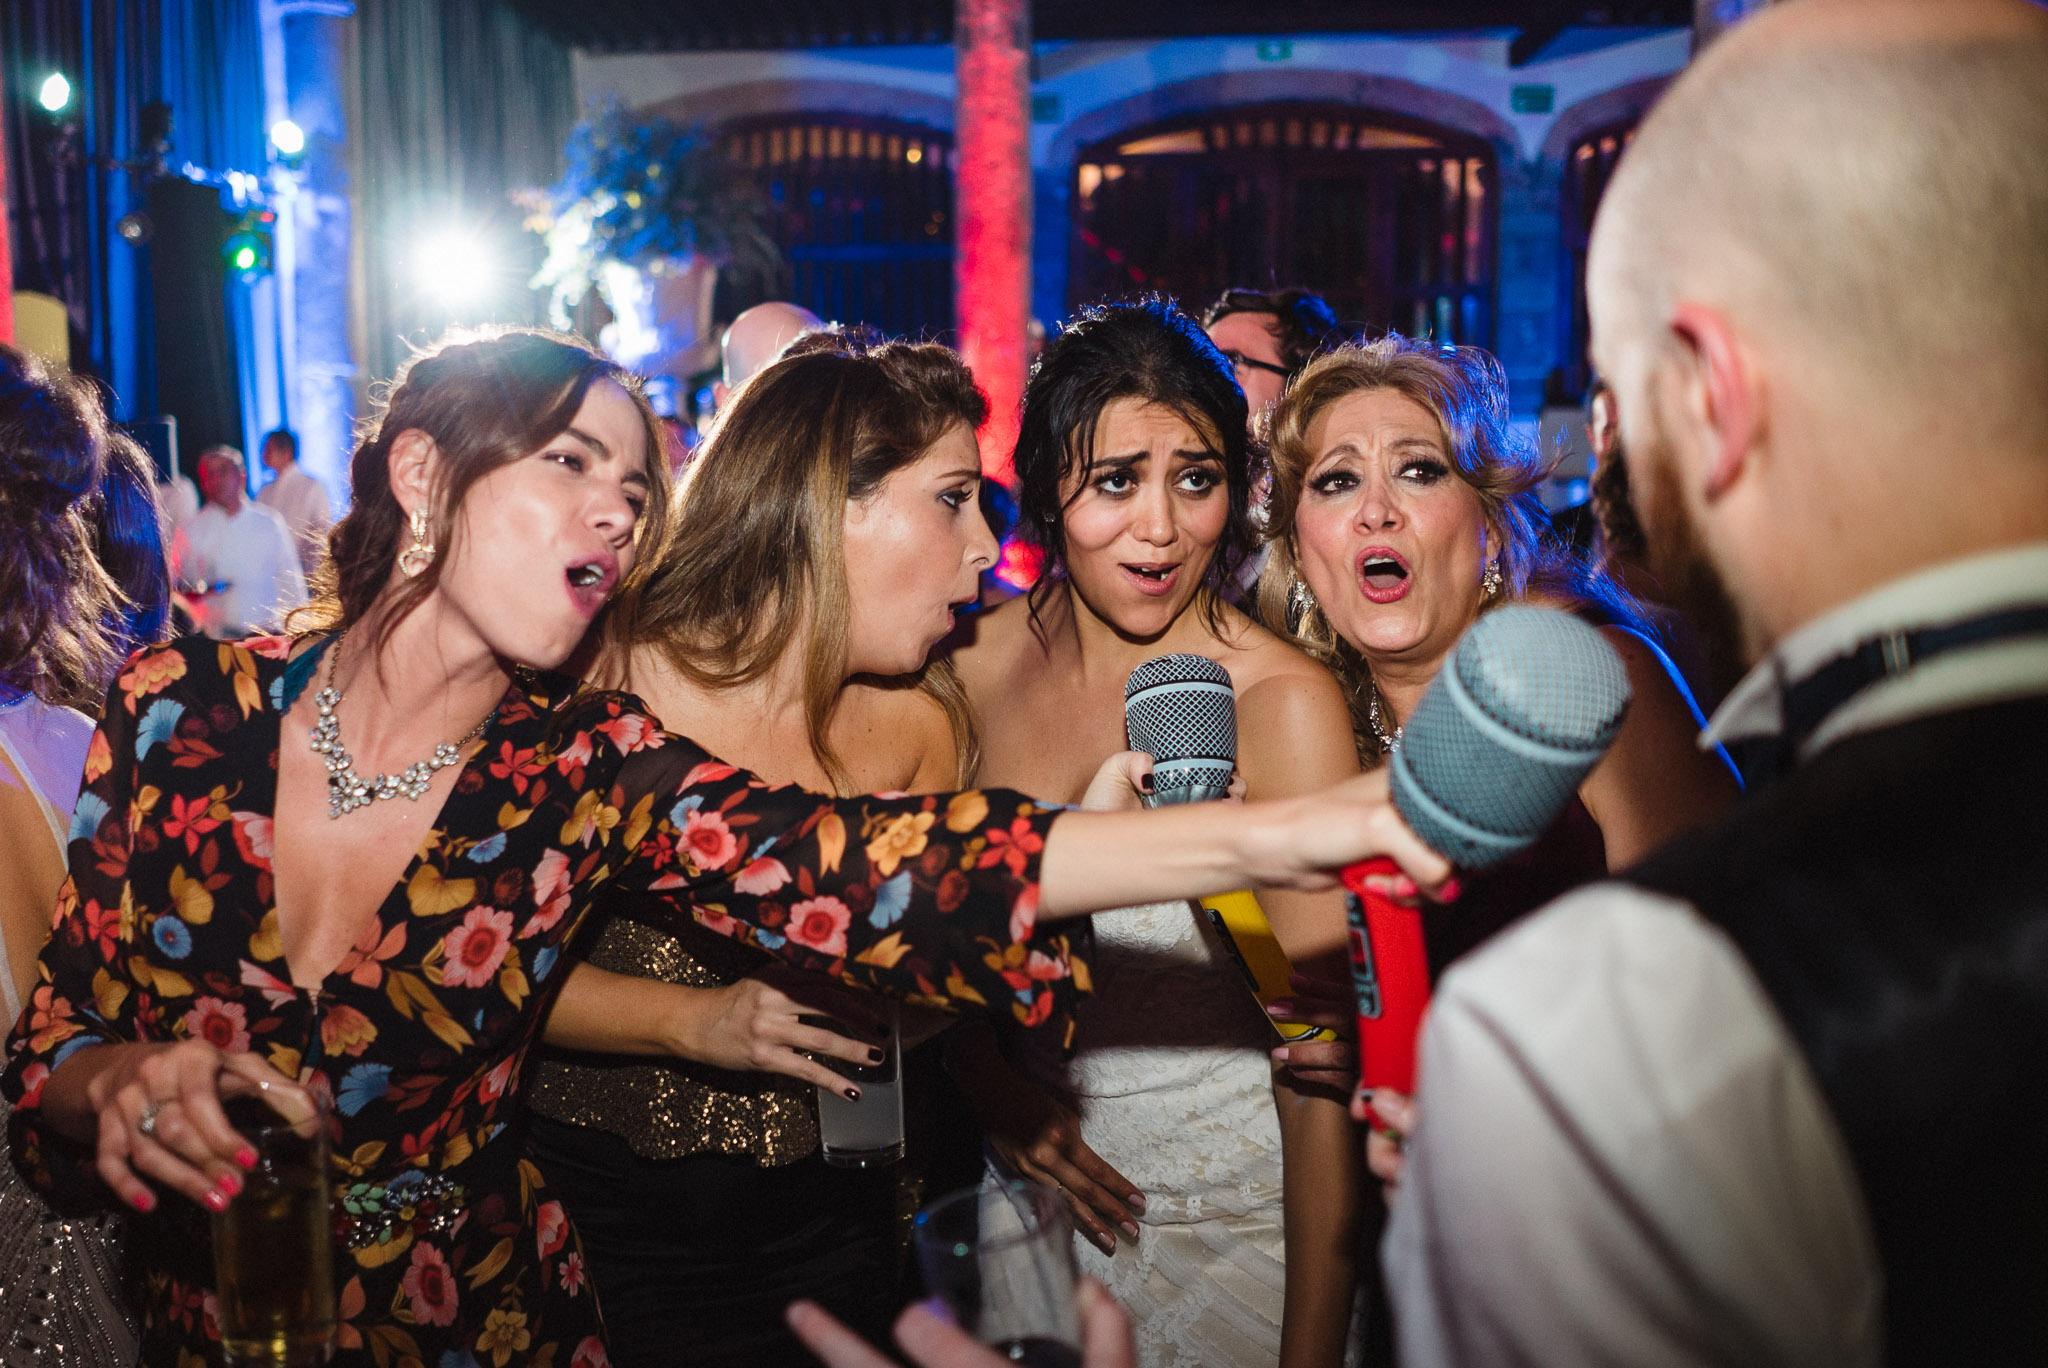 ©www.mauriziosolisbroca.com-20161002maurizio-solis-broca-mexico-canada-wedding-photographer20161002DSC00102-2-Edit.jpg